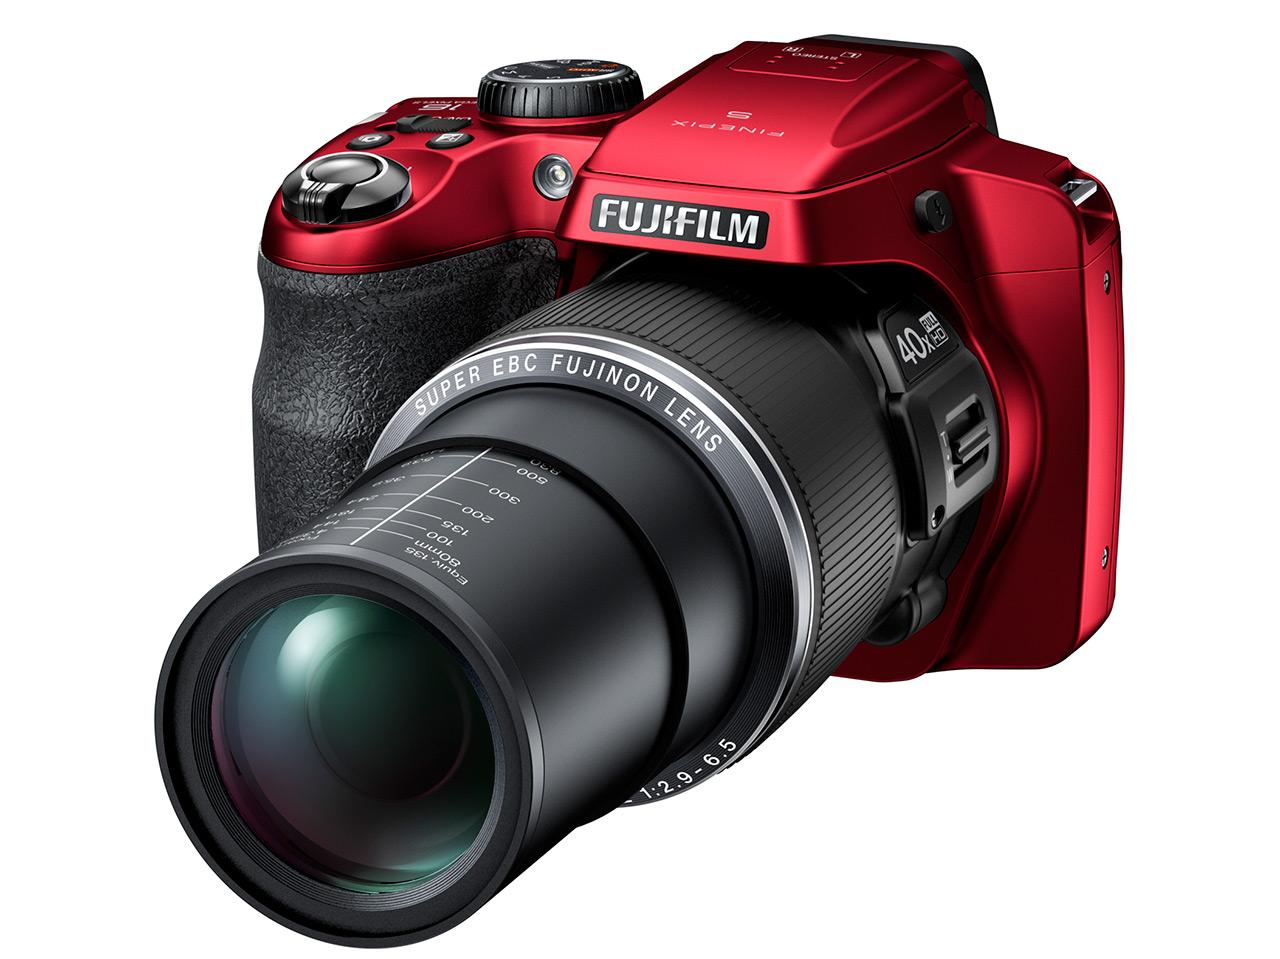 FUJIFILM FINEPIX S8300 CAMERA TREIBER